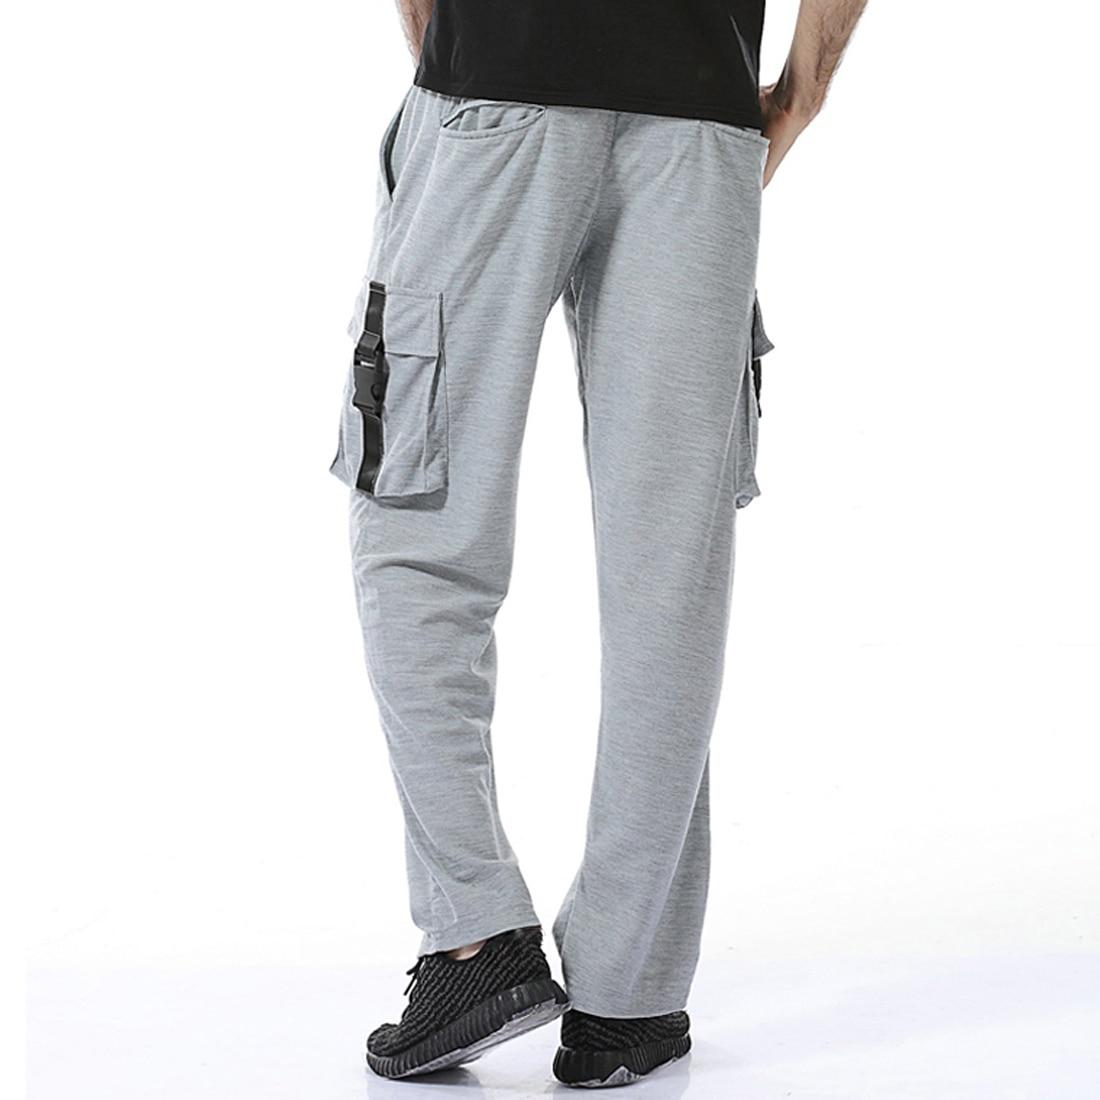 9ec2fb60874 Classical Black White Gray Sweatpants Men Elastic Waist Loose Casual ...